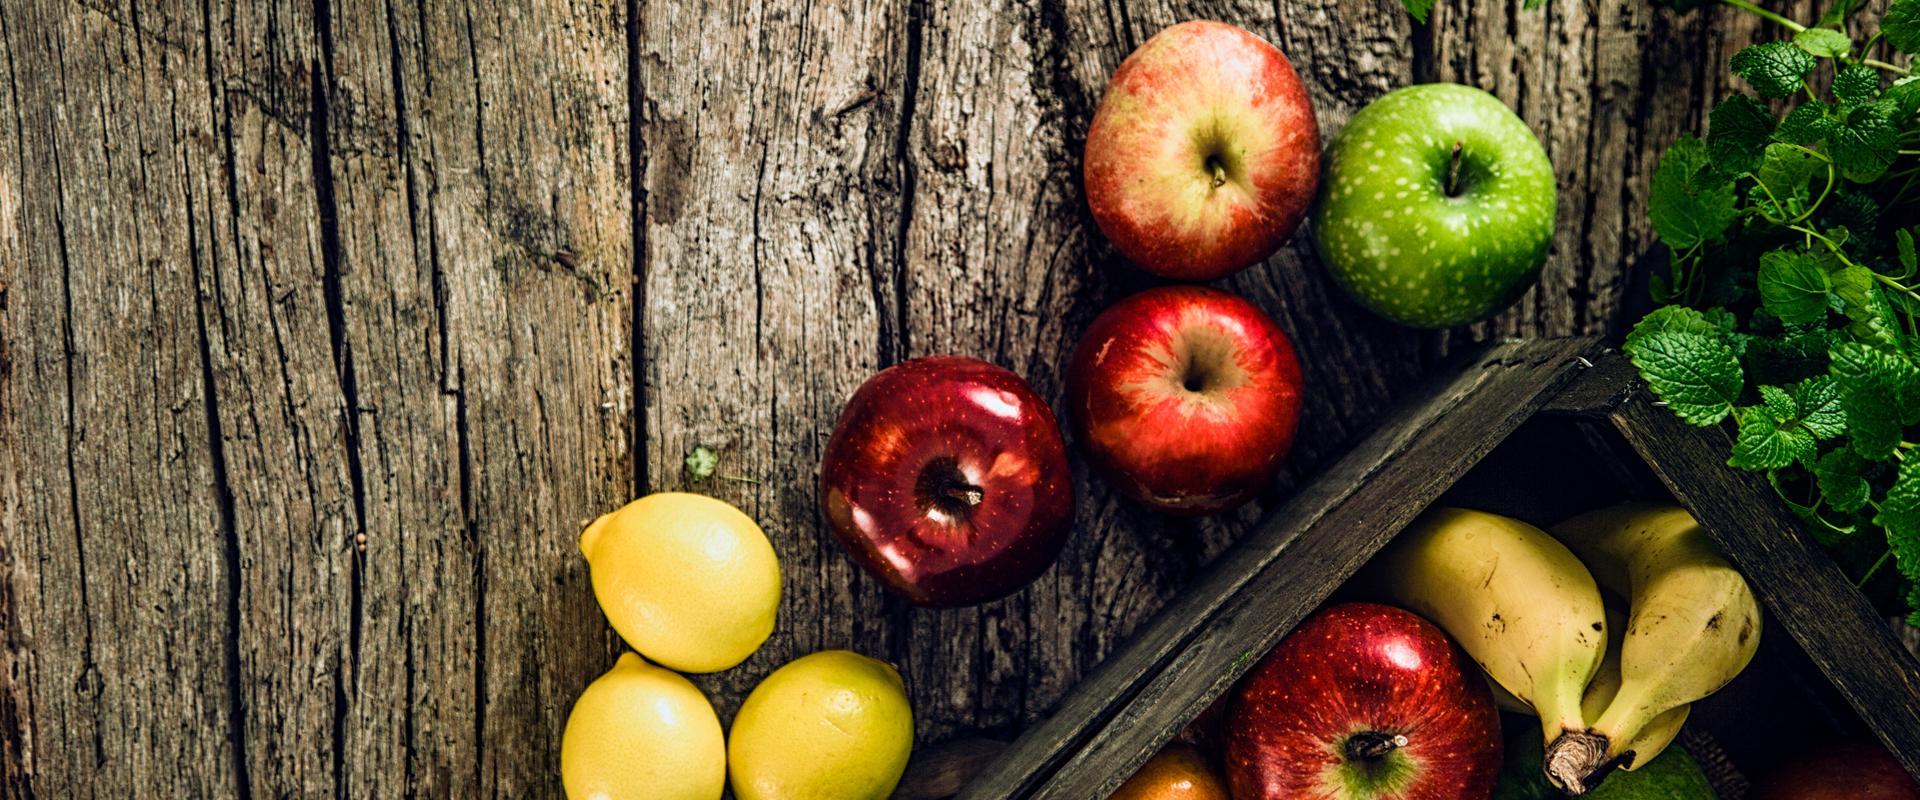 fruit-1920-800